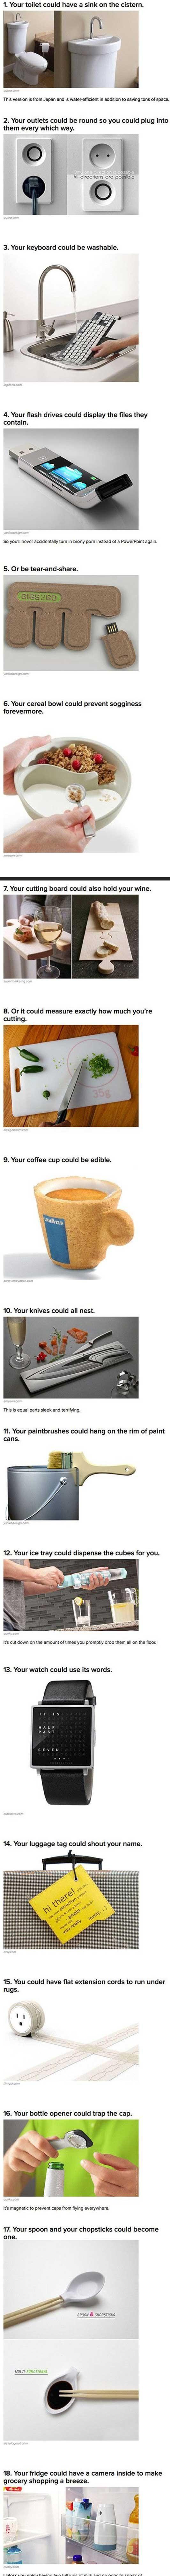 163 best Innovative Ideas & Technology images on Pinterest | Homes ...